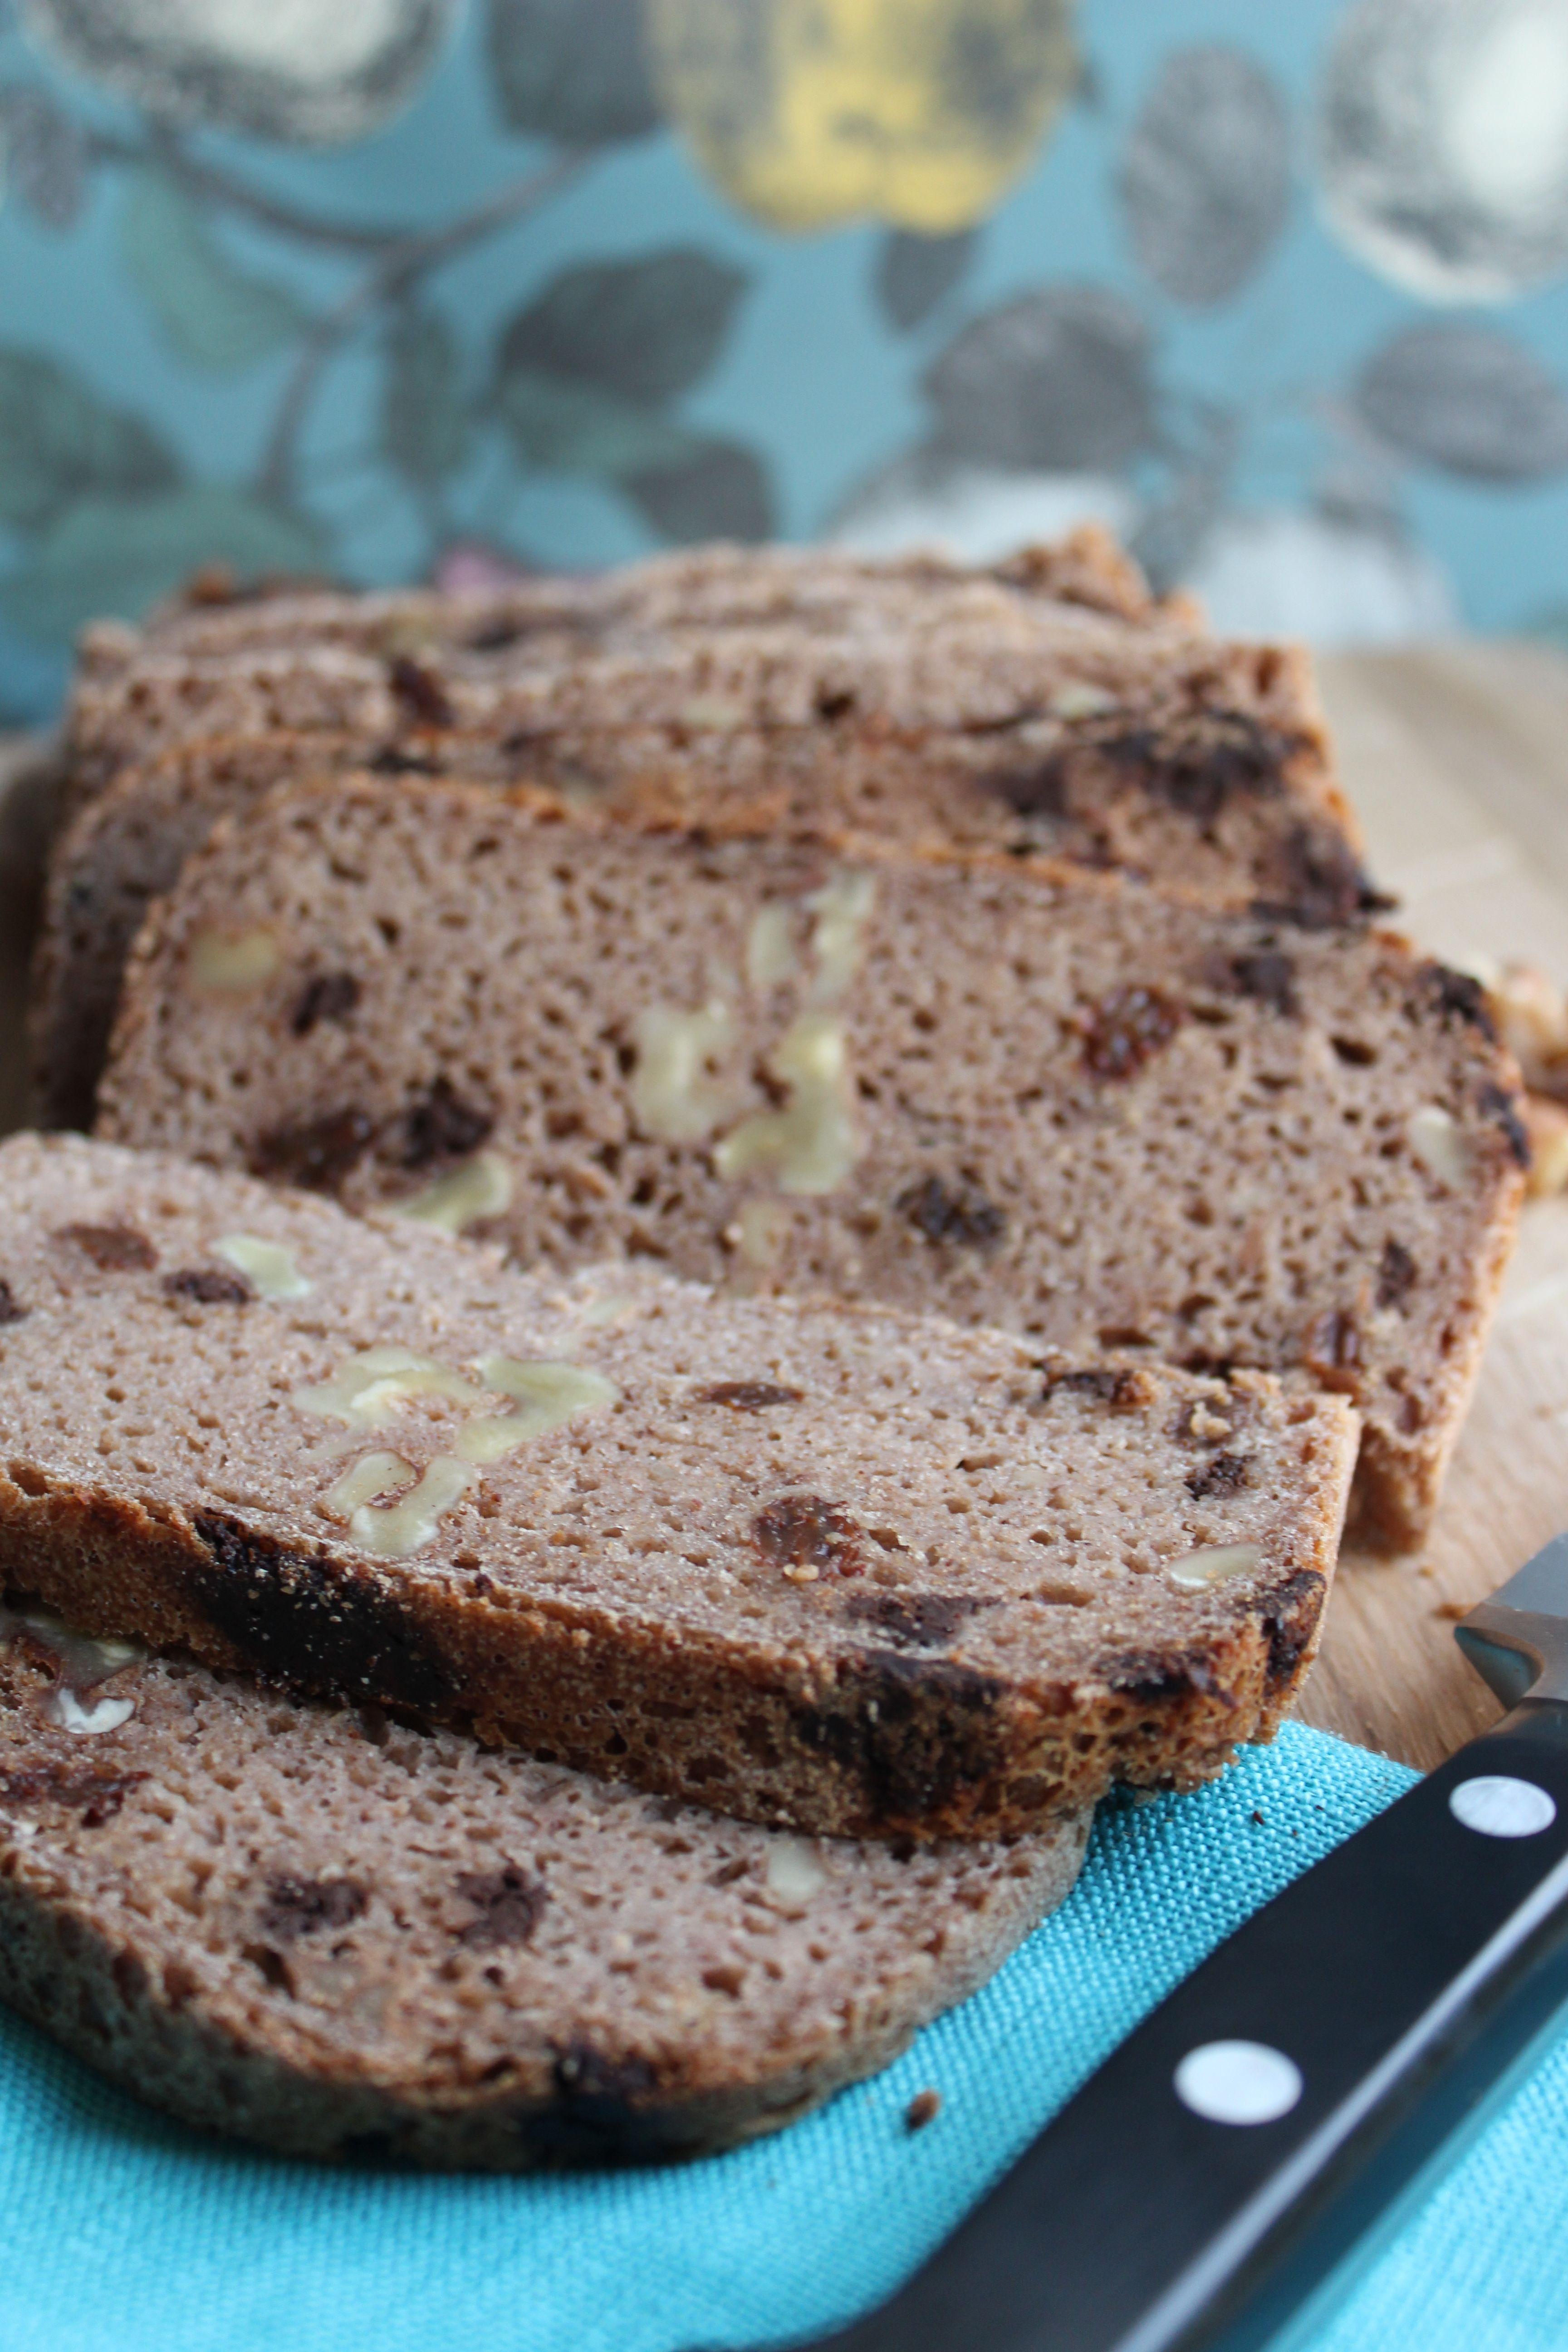 Breadmaker Gluten-free & Dairy-free Fruit, Nut & Chocolate Loaf